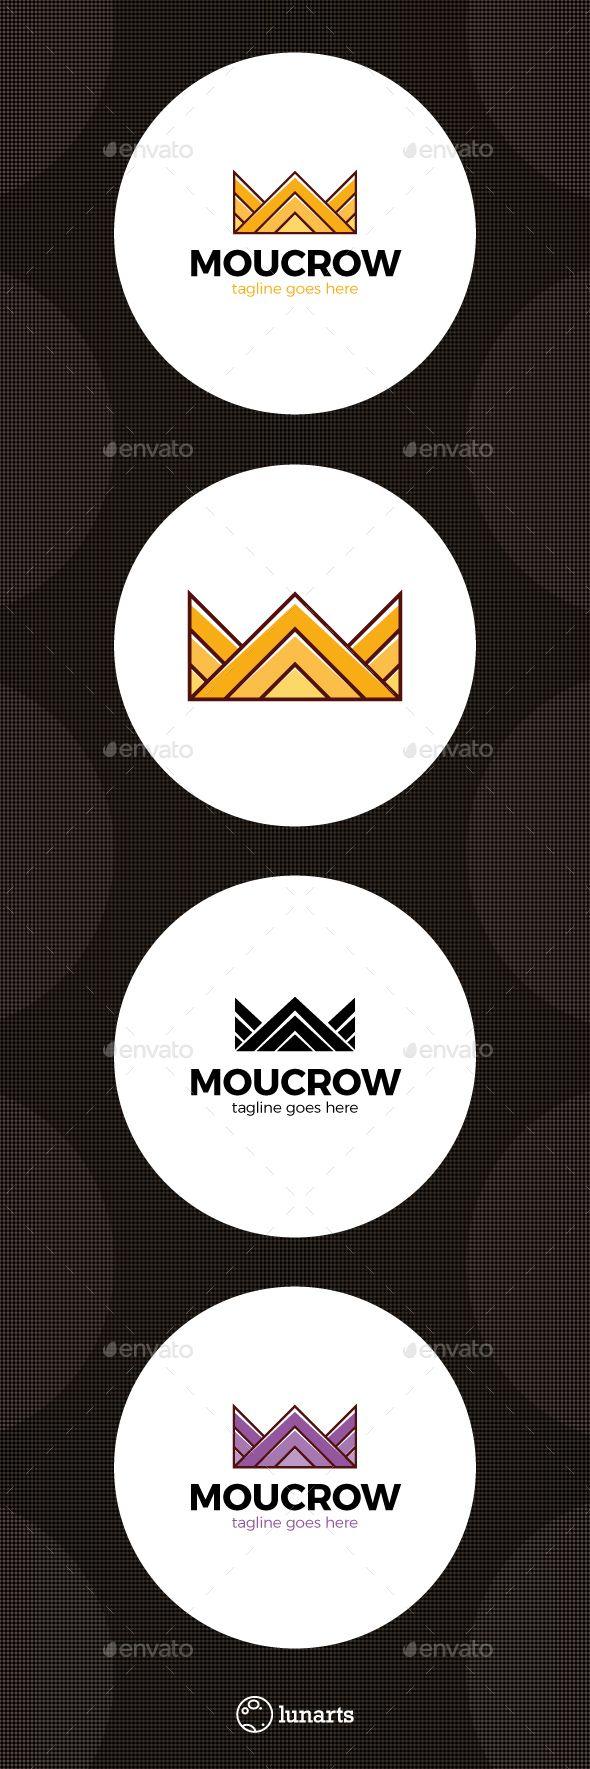 Mountain Crown  Logo Design Template Vector #logotype Download it here: http://graphicriver.net/item/mountain-crown-logo/15208225?s_rank=95?ref=nexion